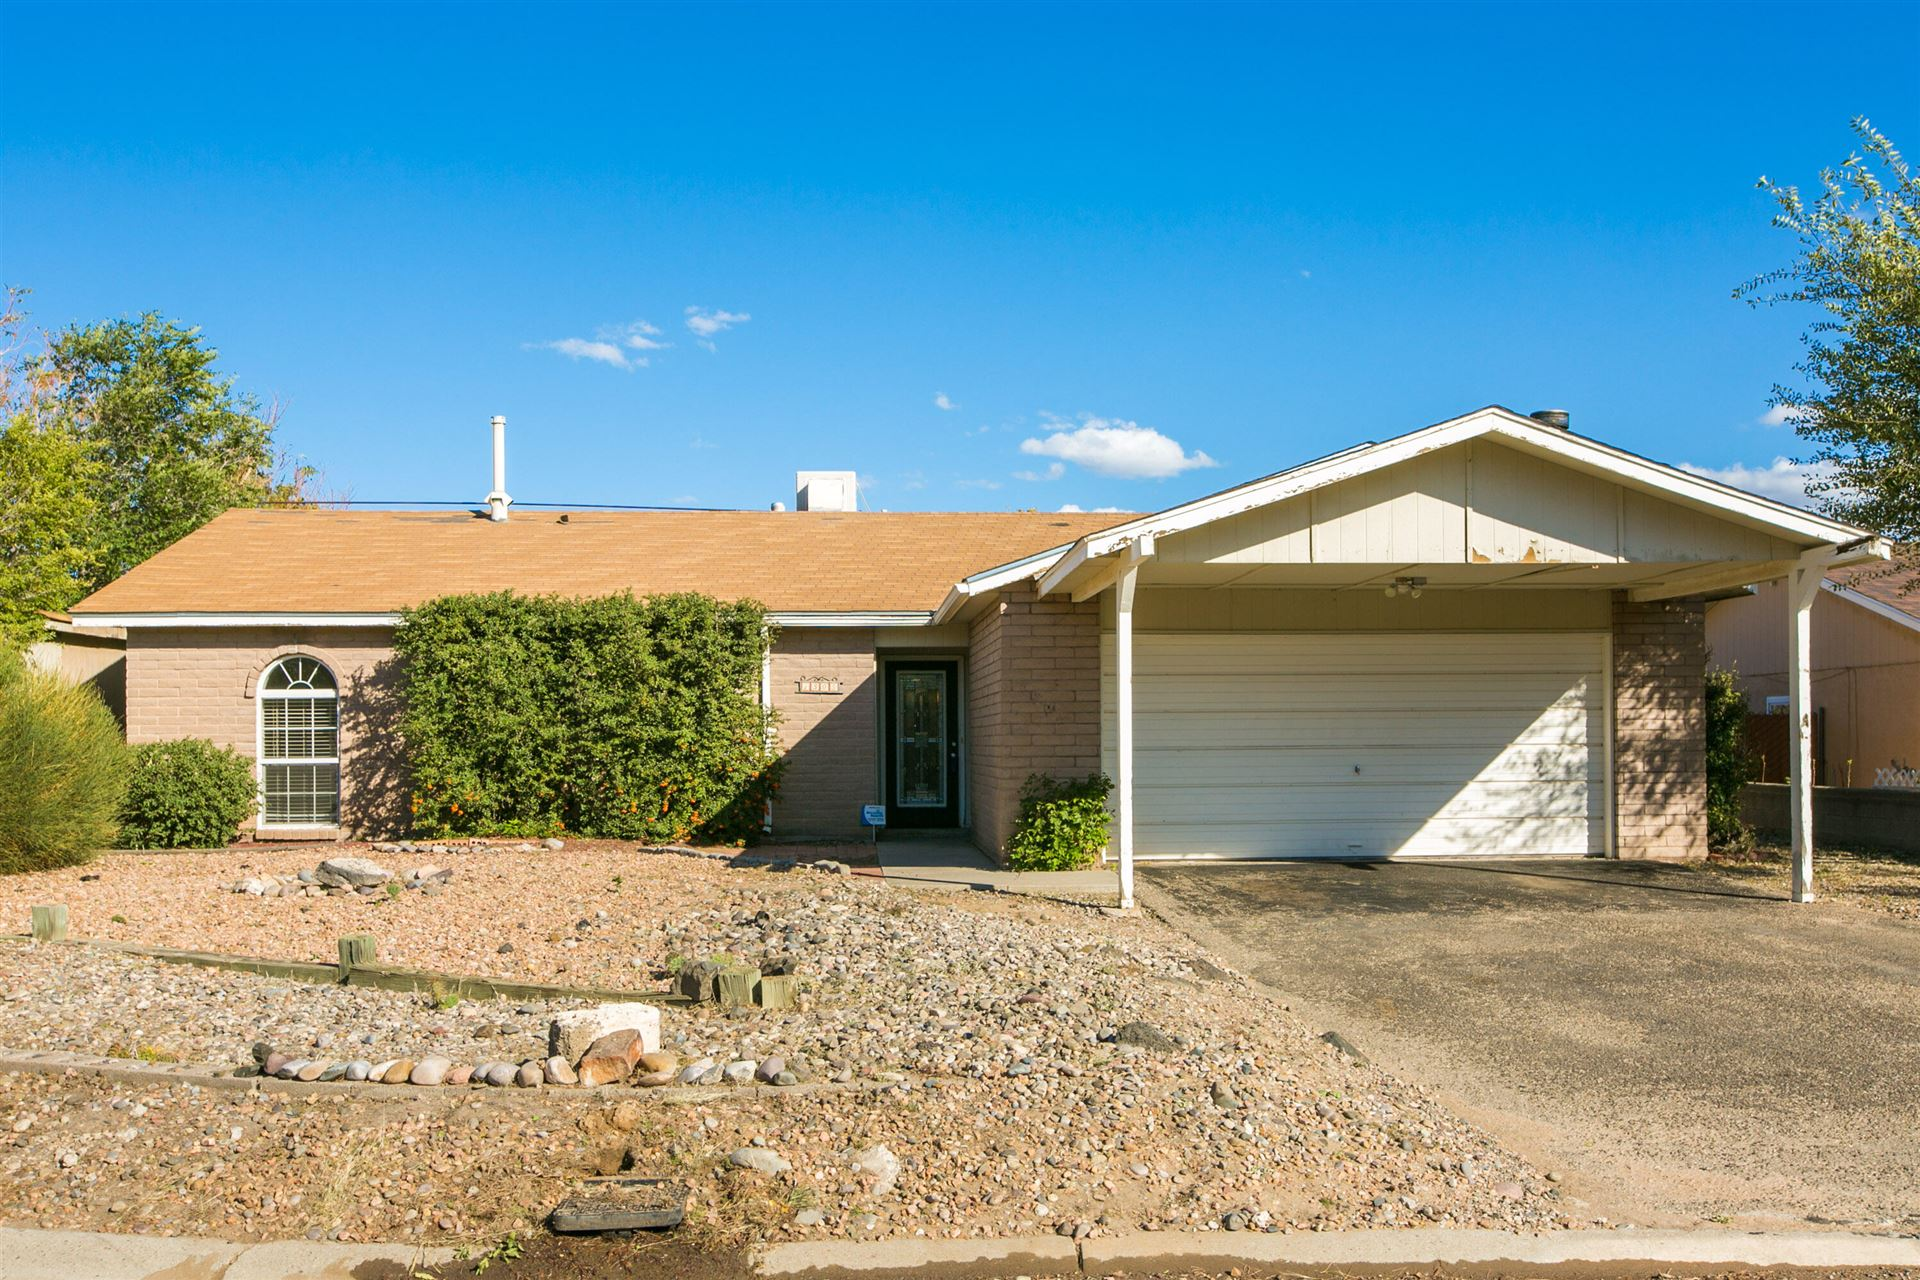 1305 EPIC Court SE, Rio Rancho, NM 87124 - #: 1002987